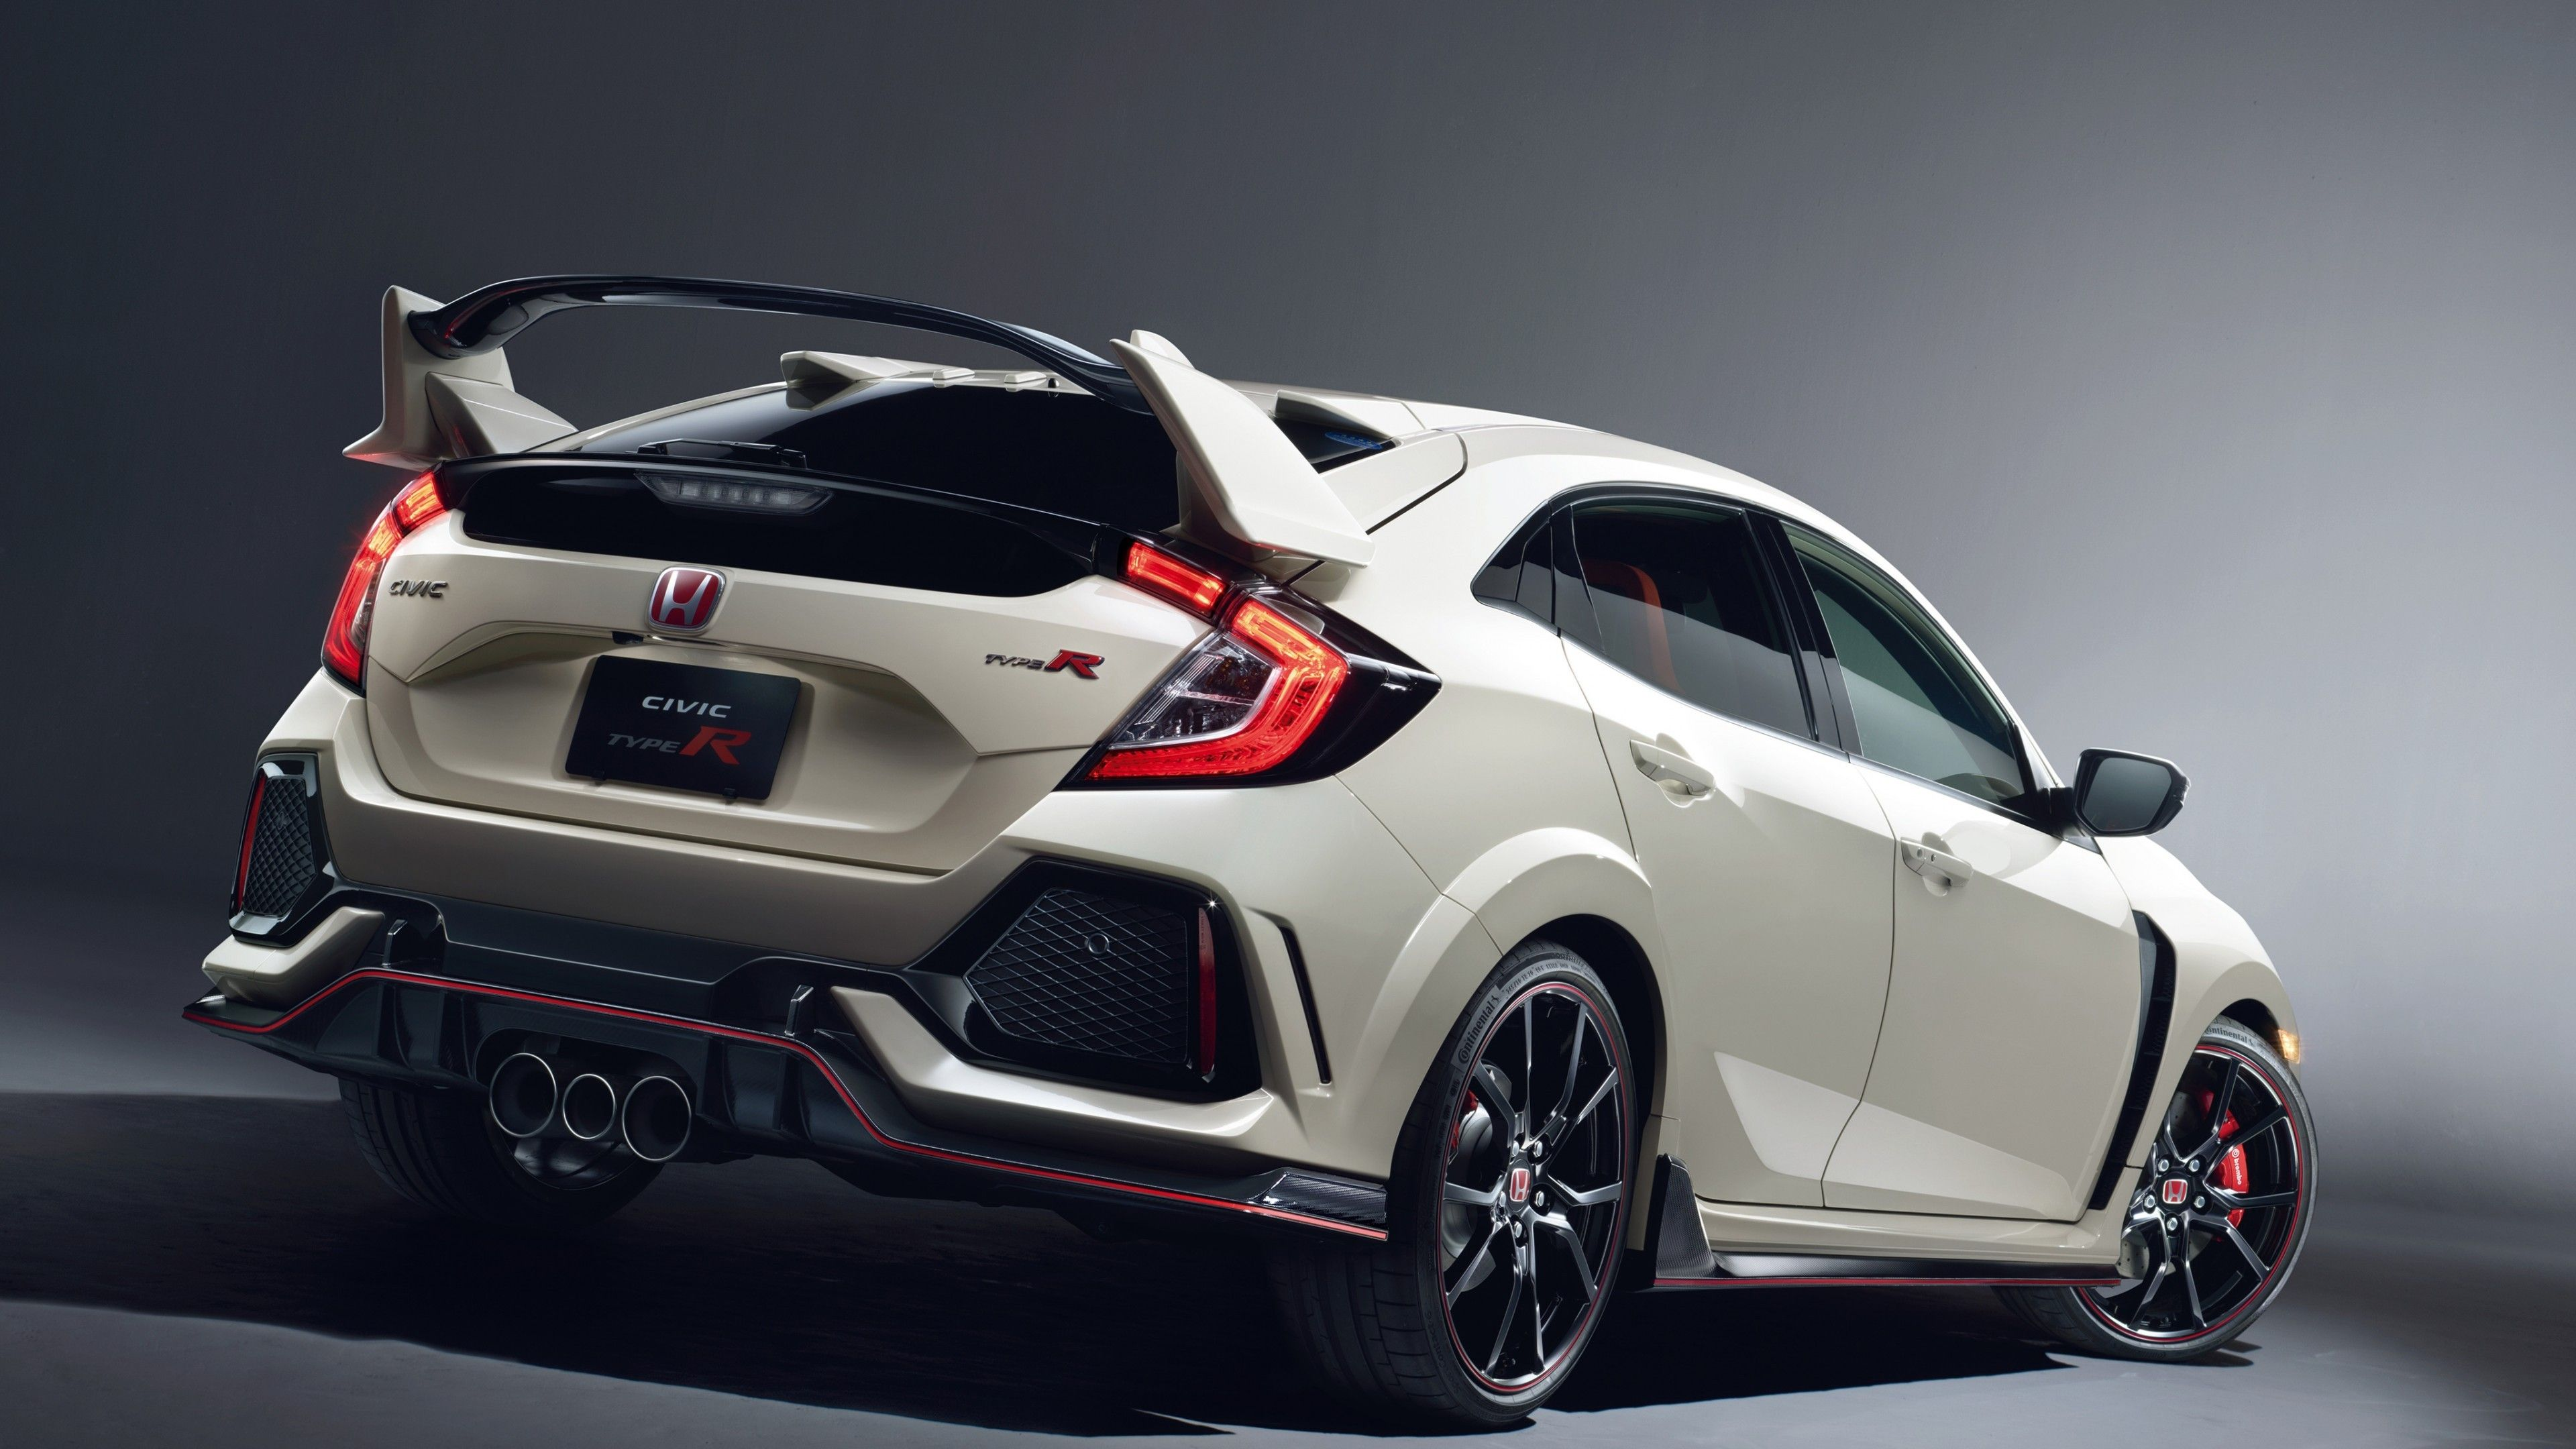 4k Honda Civic Wallpapers Top Free 4k Honda Civic Backgrounds Wallpaperaccess